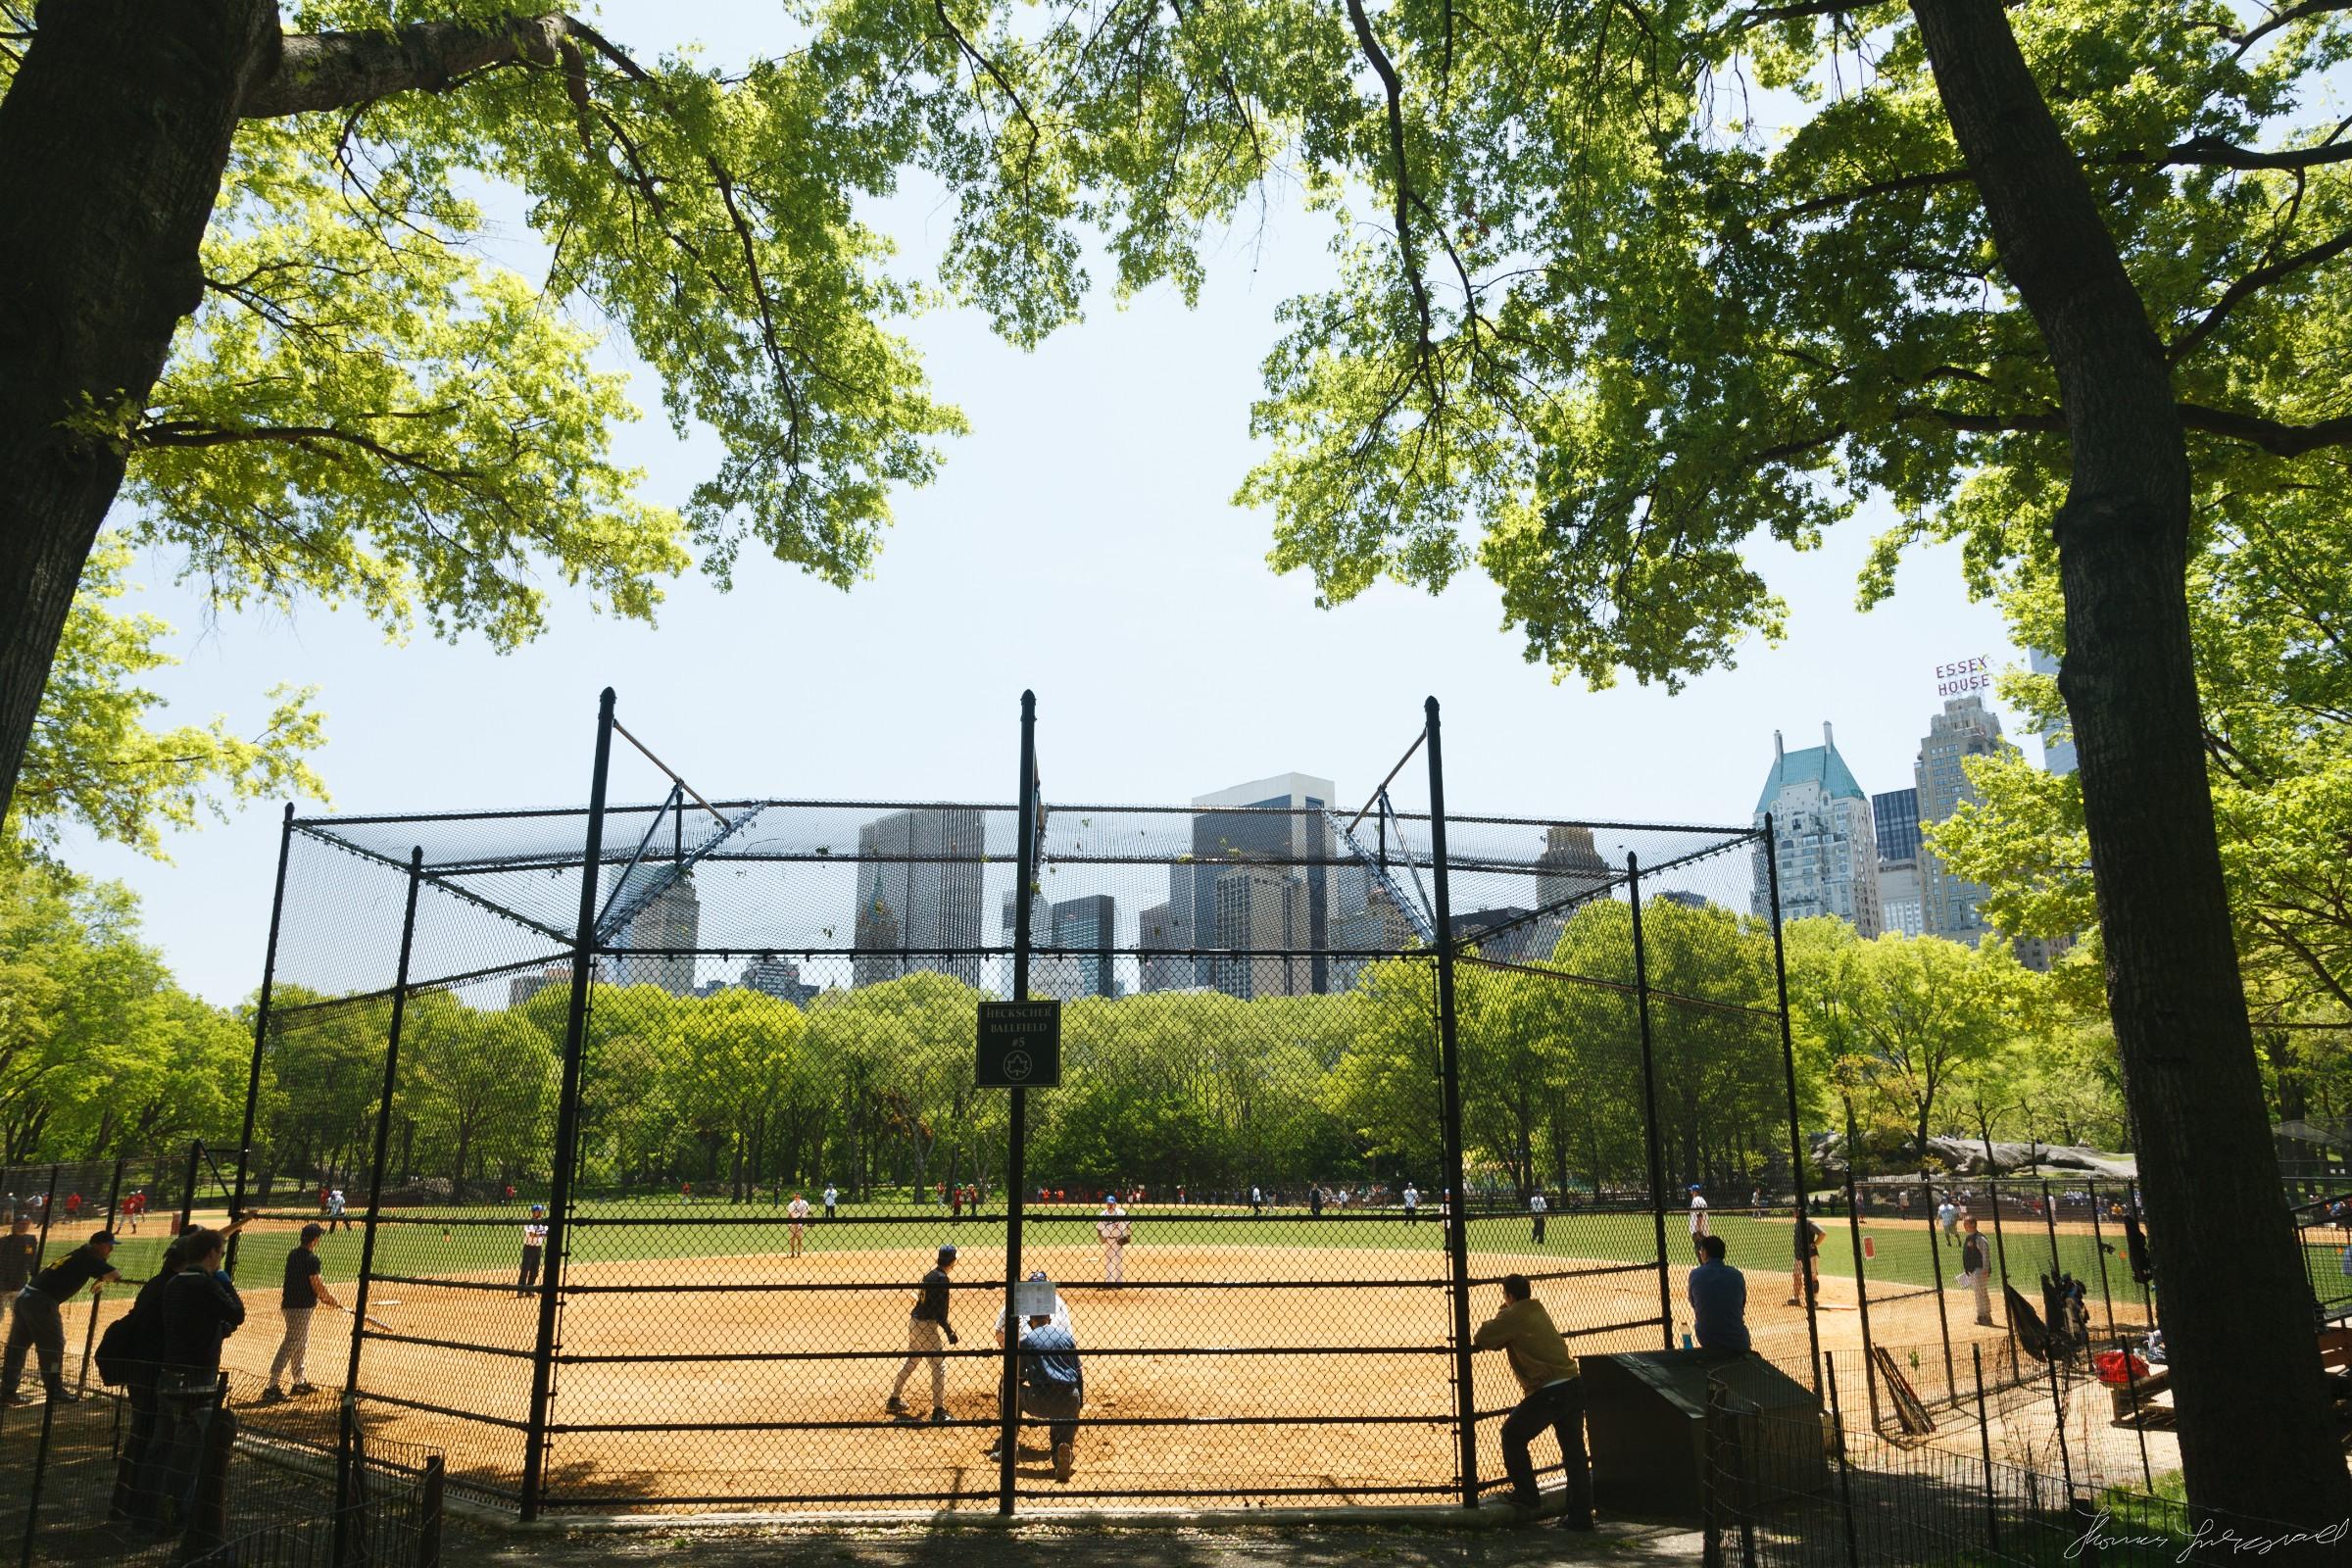 Central-Park-New-York-City-9.jpg